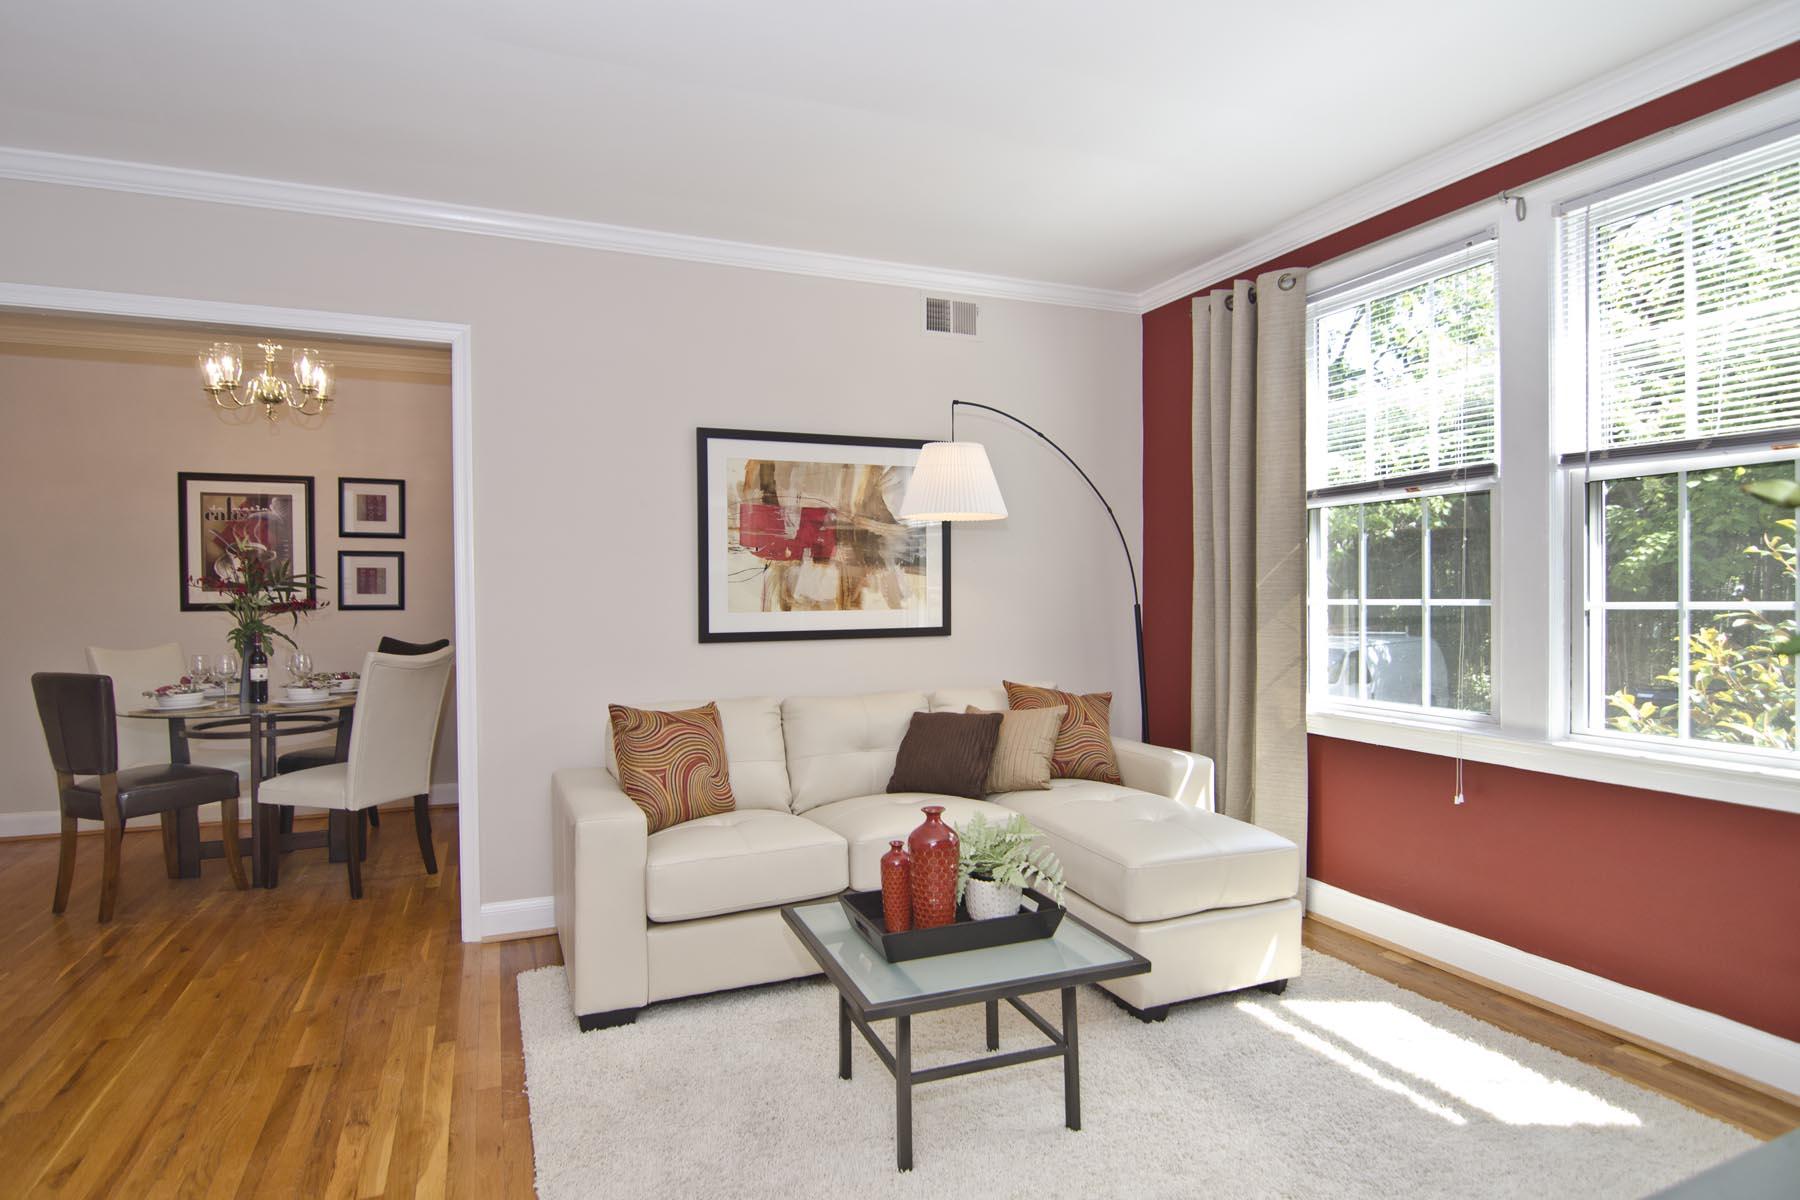 Del ray apartments for rent manor house apartments for 1 bedroom apartments alexandria va